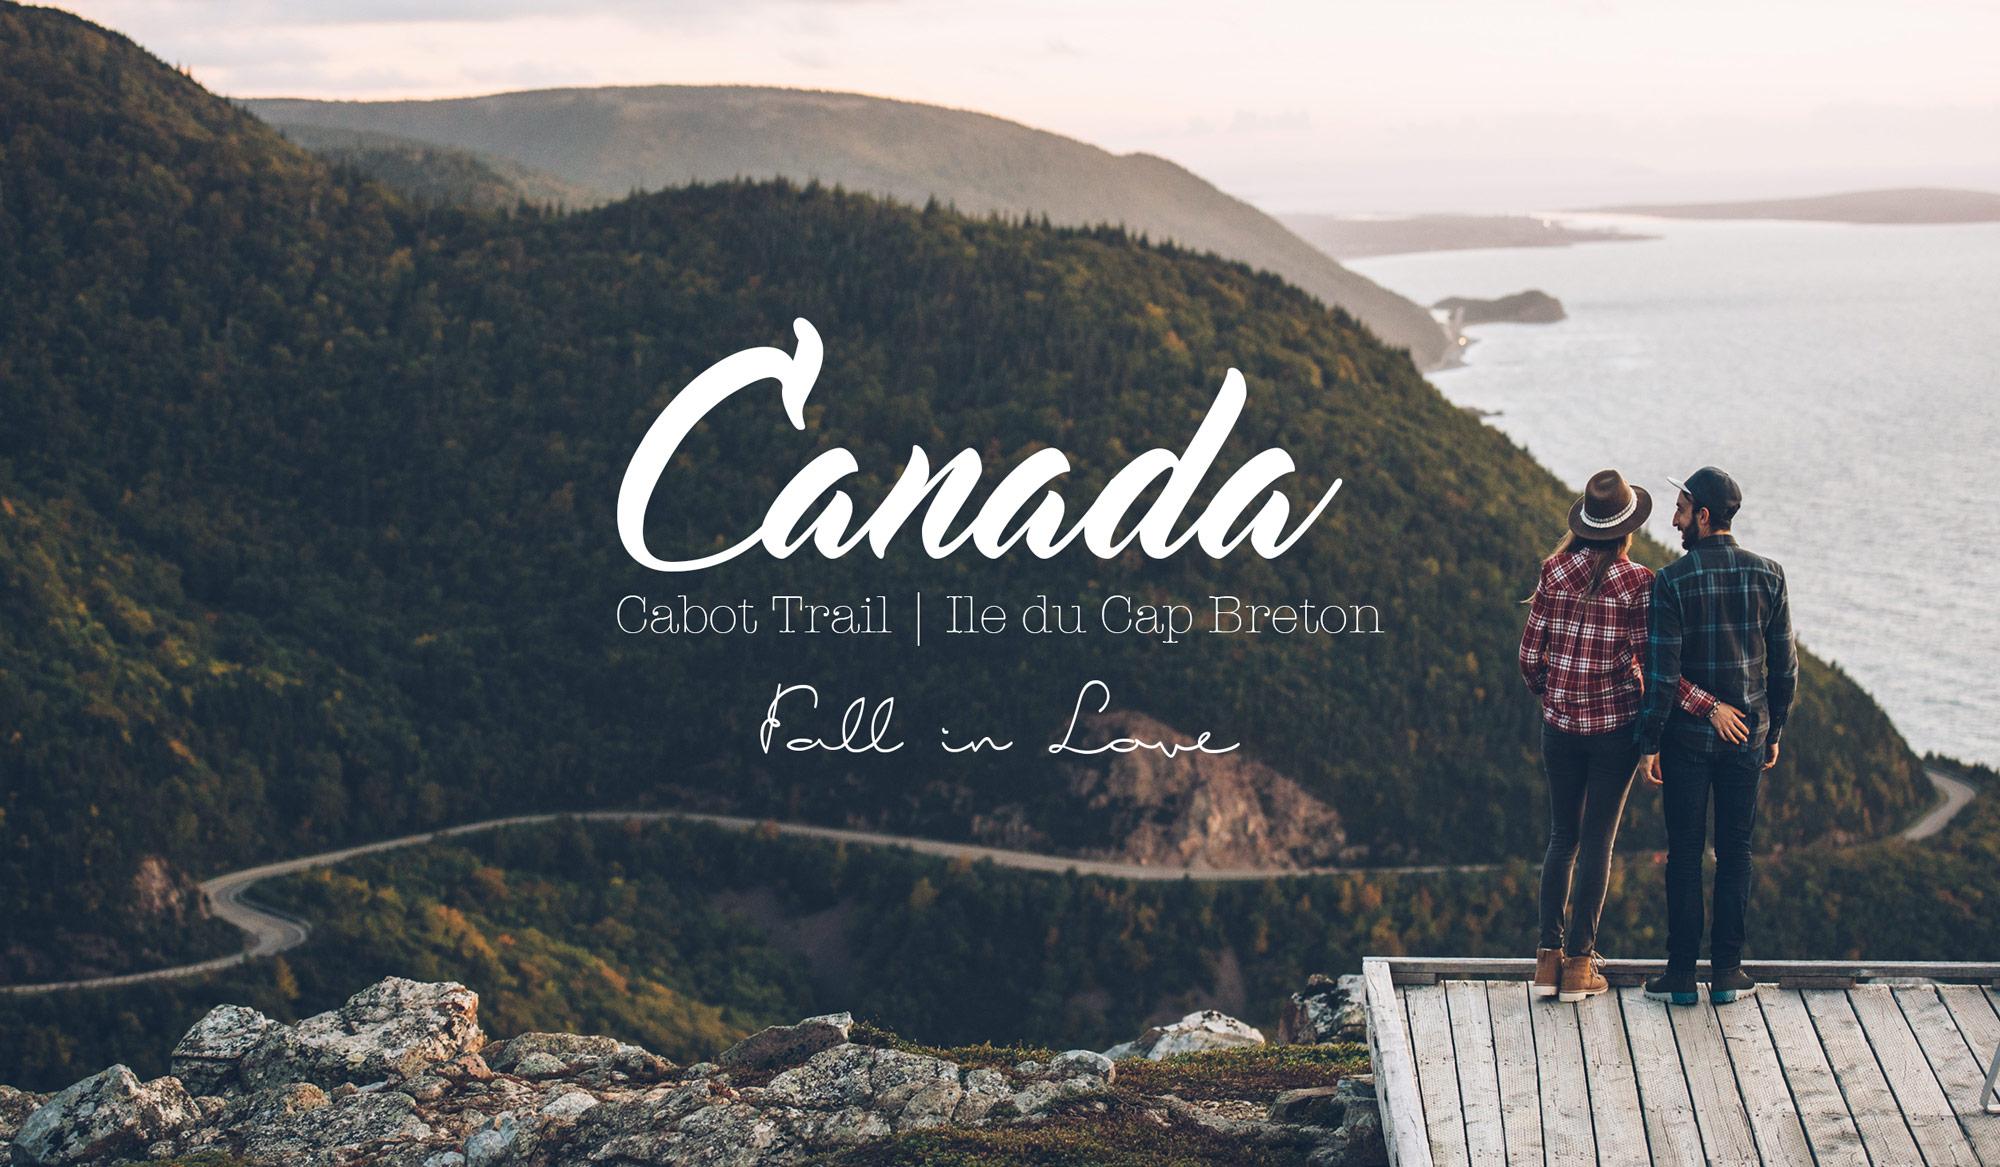 Piste Cabot Trail, Ile du Cap breton, Canada